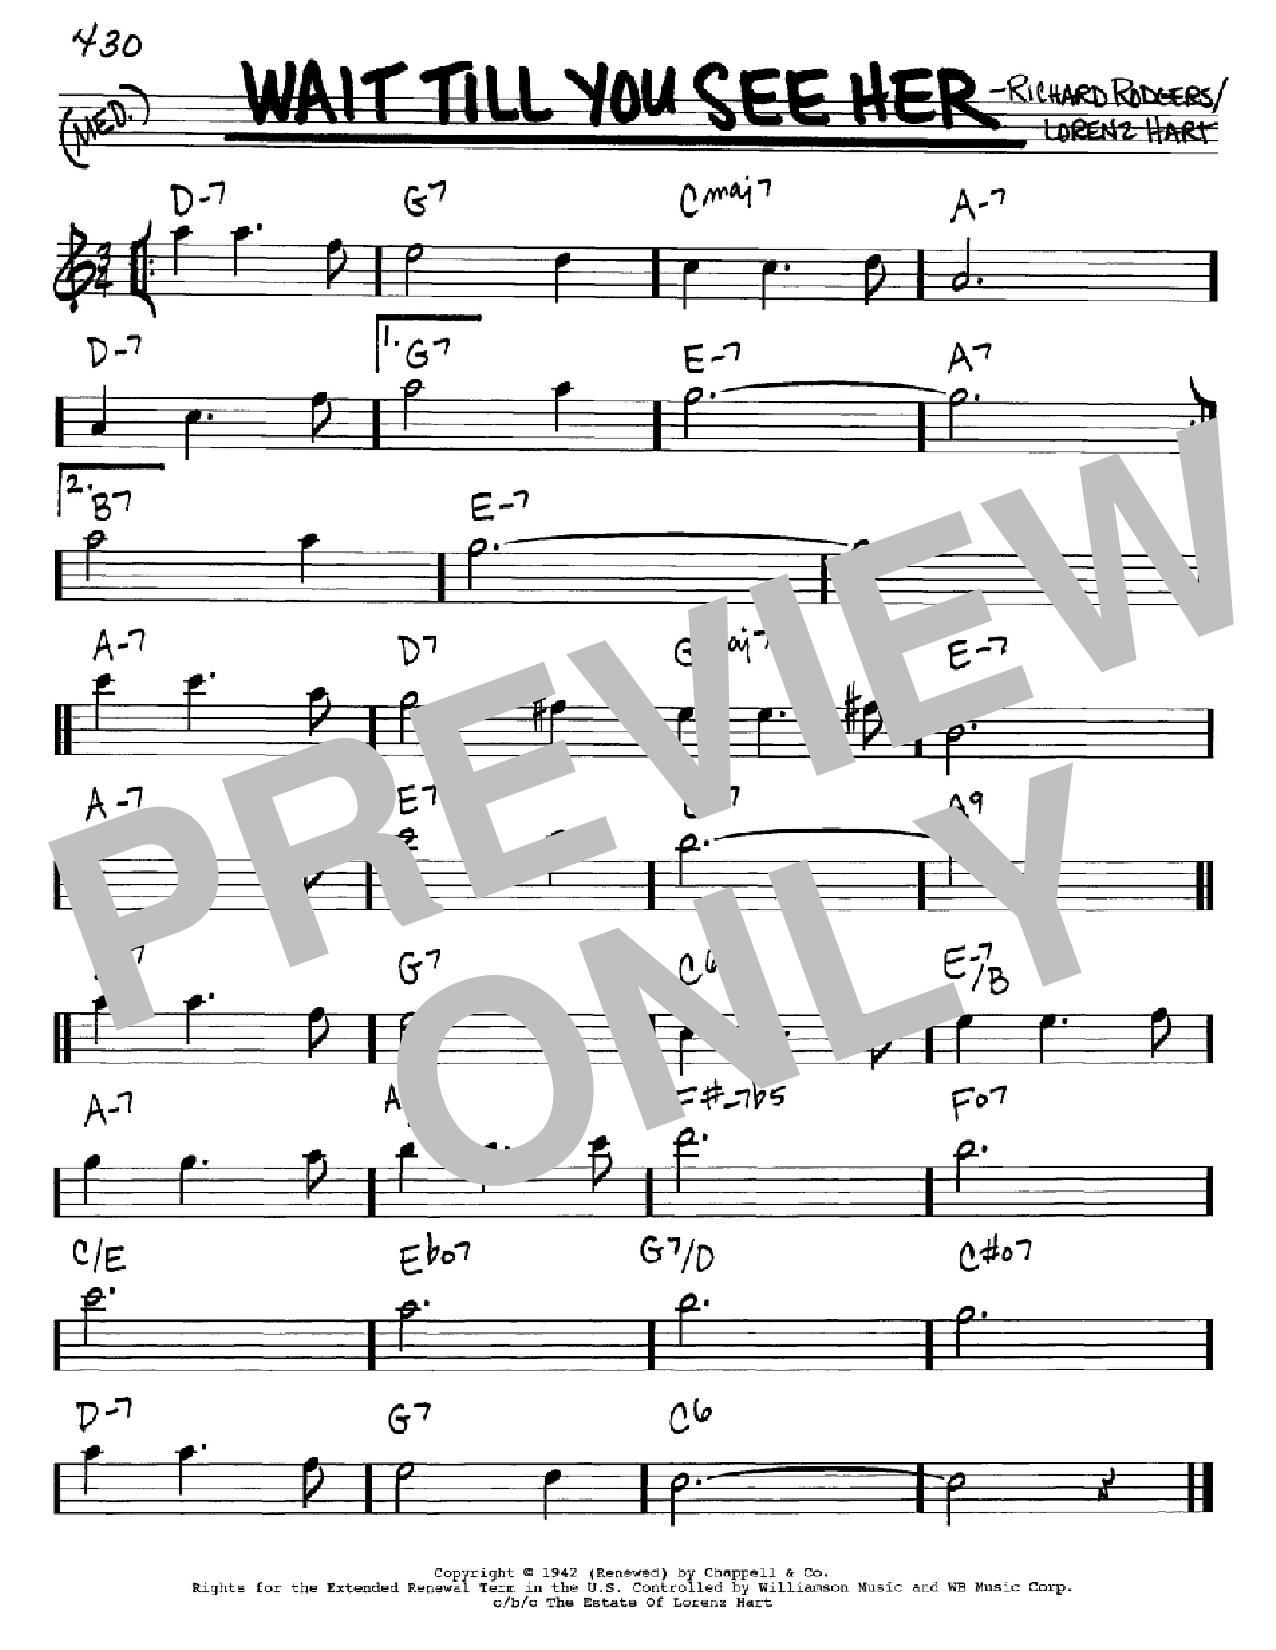 Partition autre Wait Till You See Her de Rodgers & Hart - Real Book, Melodie et Accords, Inst. En Mib